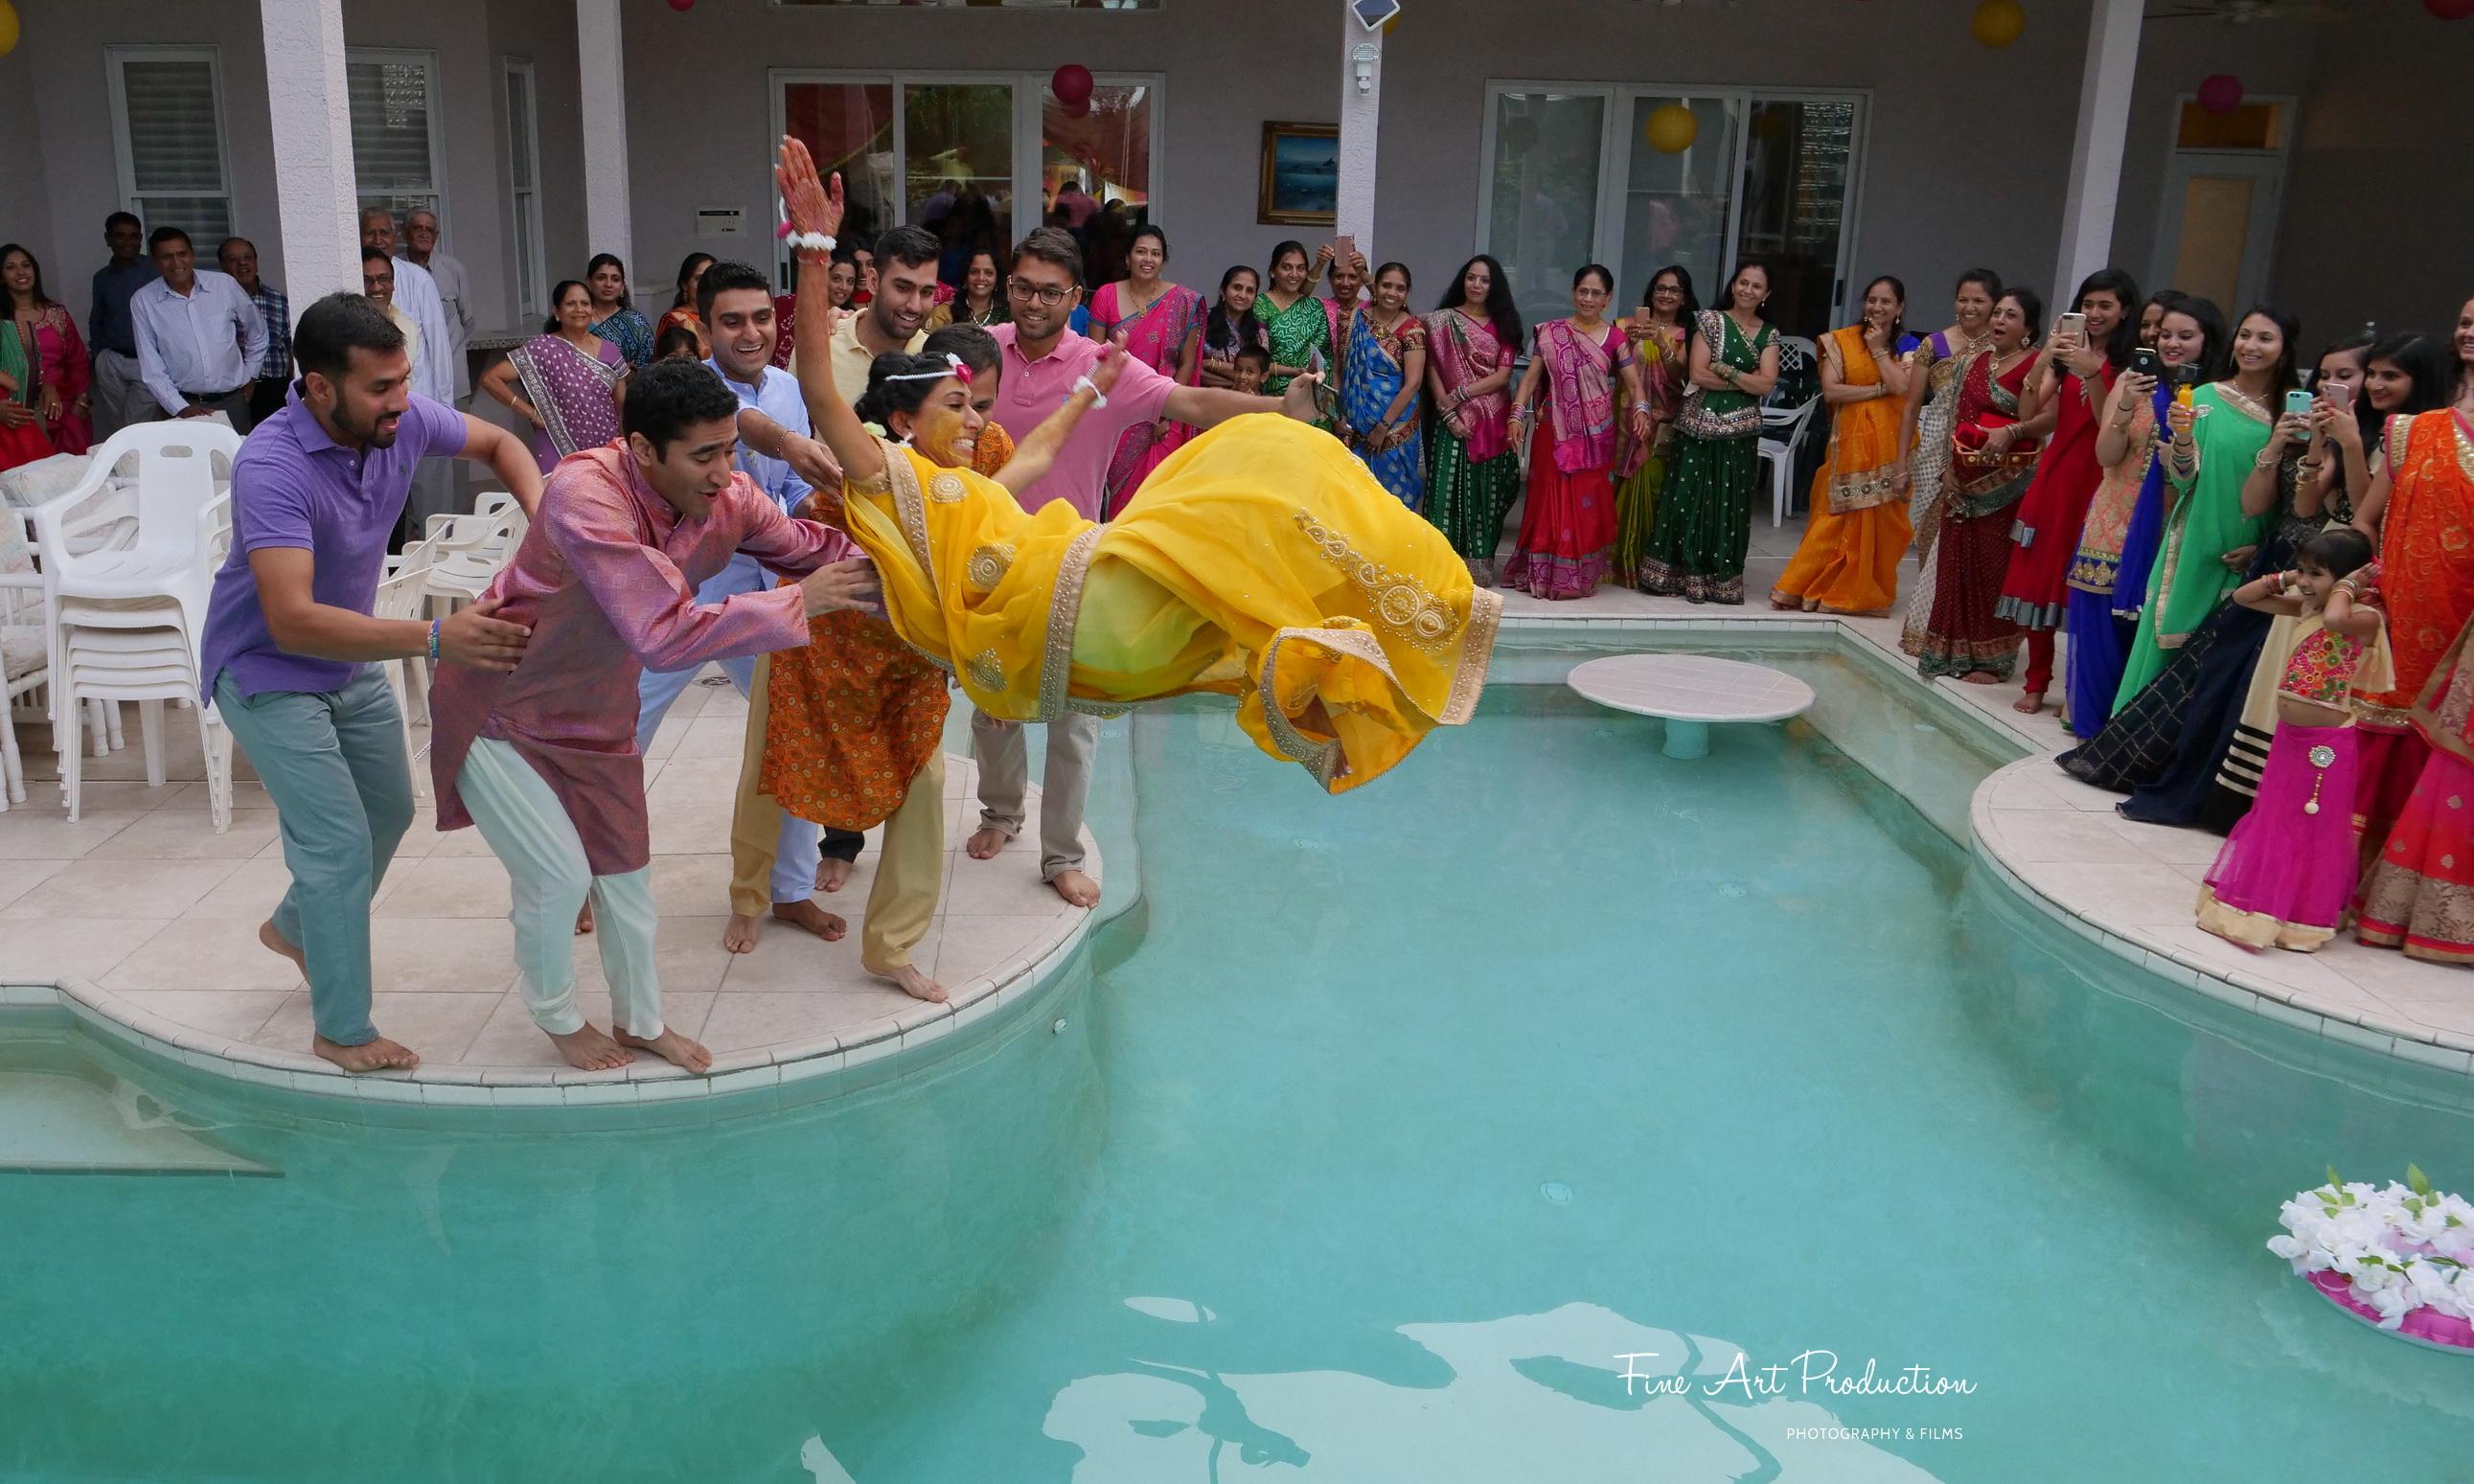 india-wedding-photographer-fine-art-production-chirali-amish-thakkar_0106